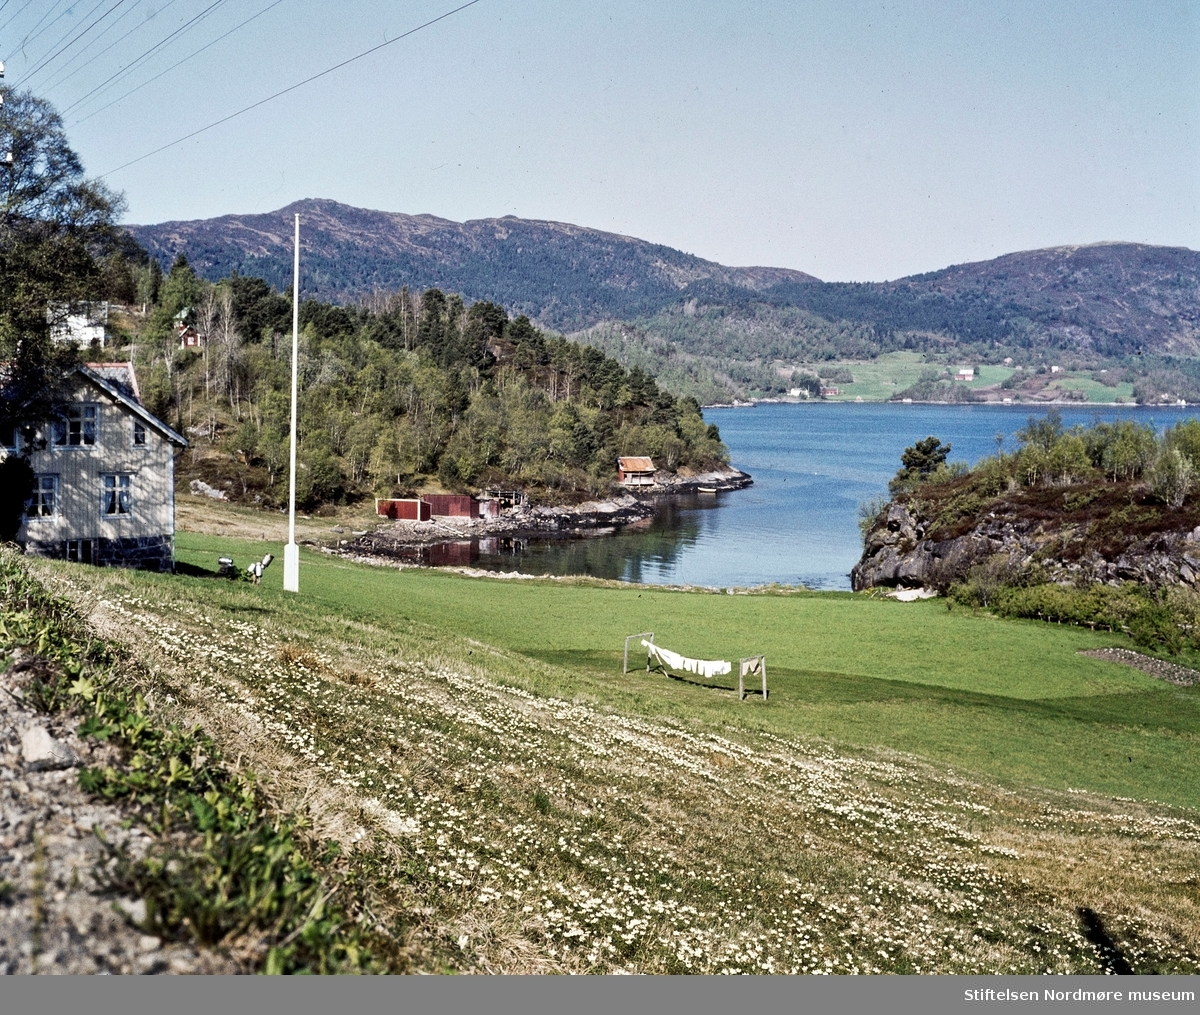 Klesvask, melkespann, tun, landbruk, idyll, gård, fjord, strand. På Freiøya? Portfoliodias fra fotograf Nils Willams sitt arkiv. Nordmøre Museums fotosamlinger.